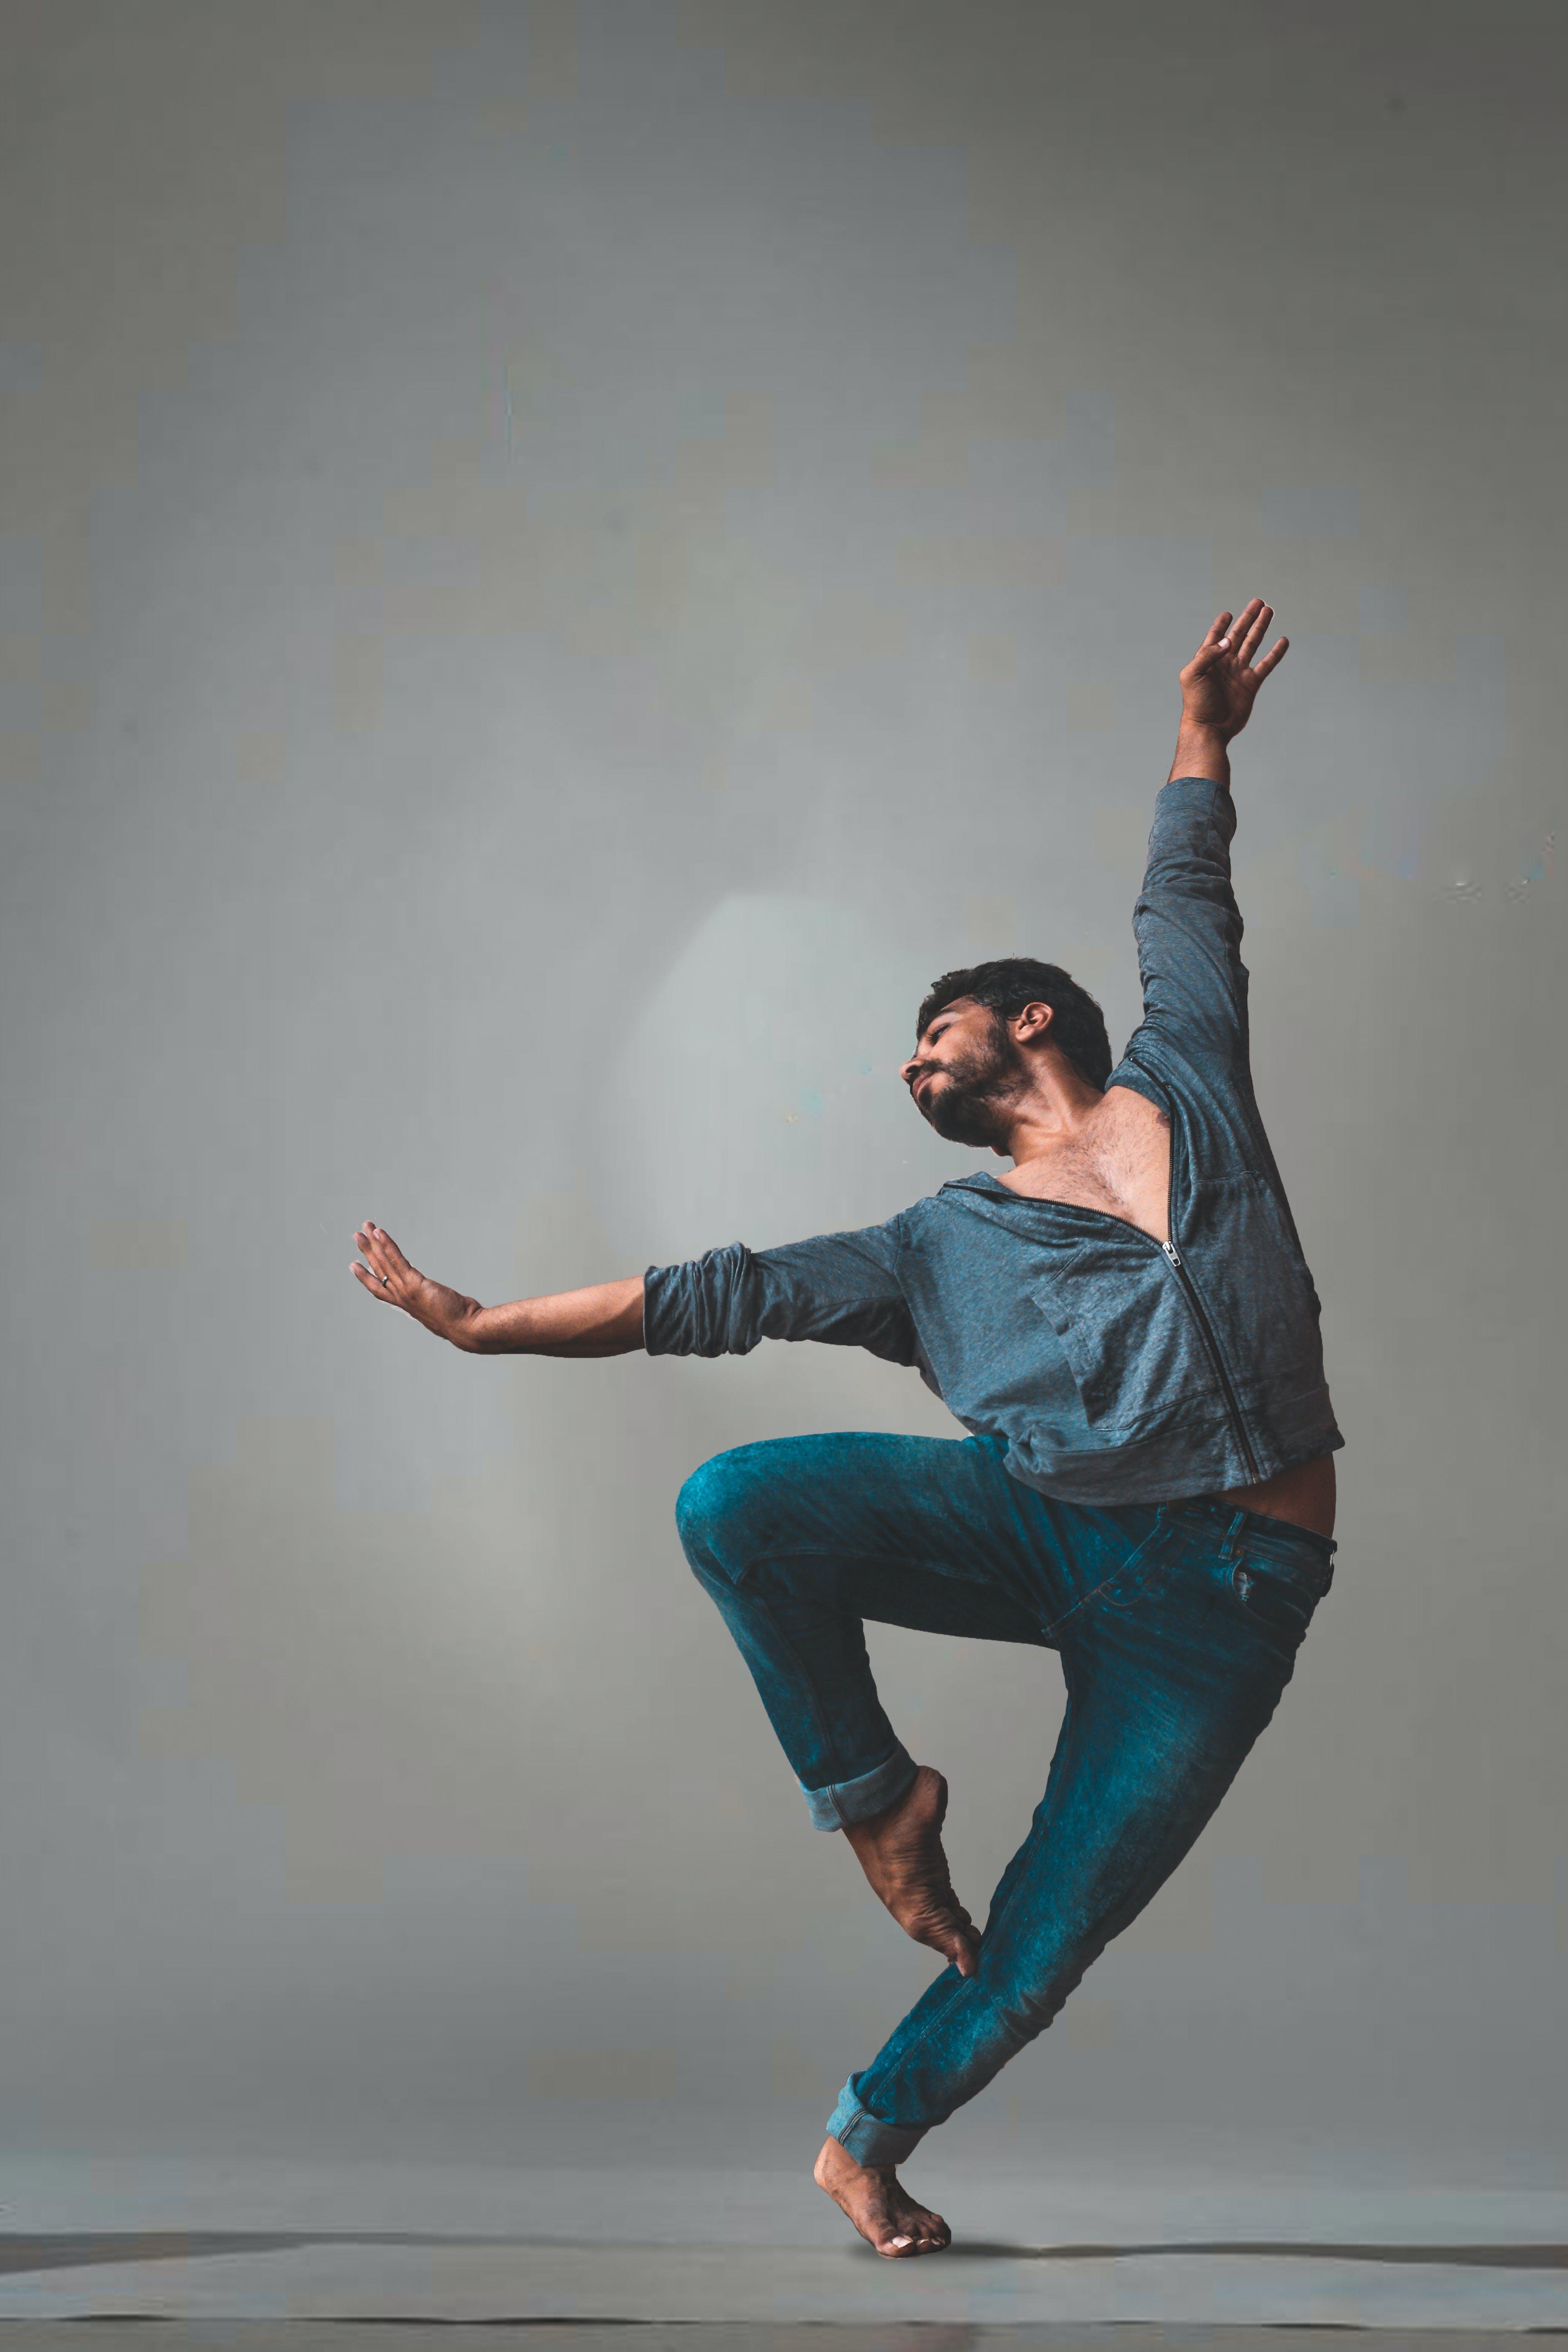 Man Dancing Near White Wall